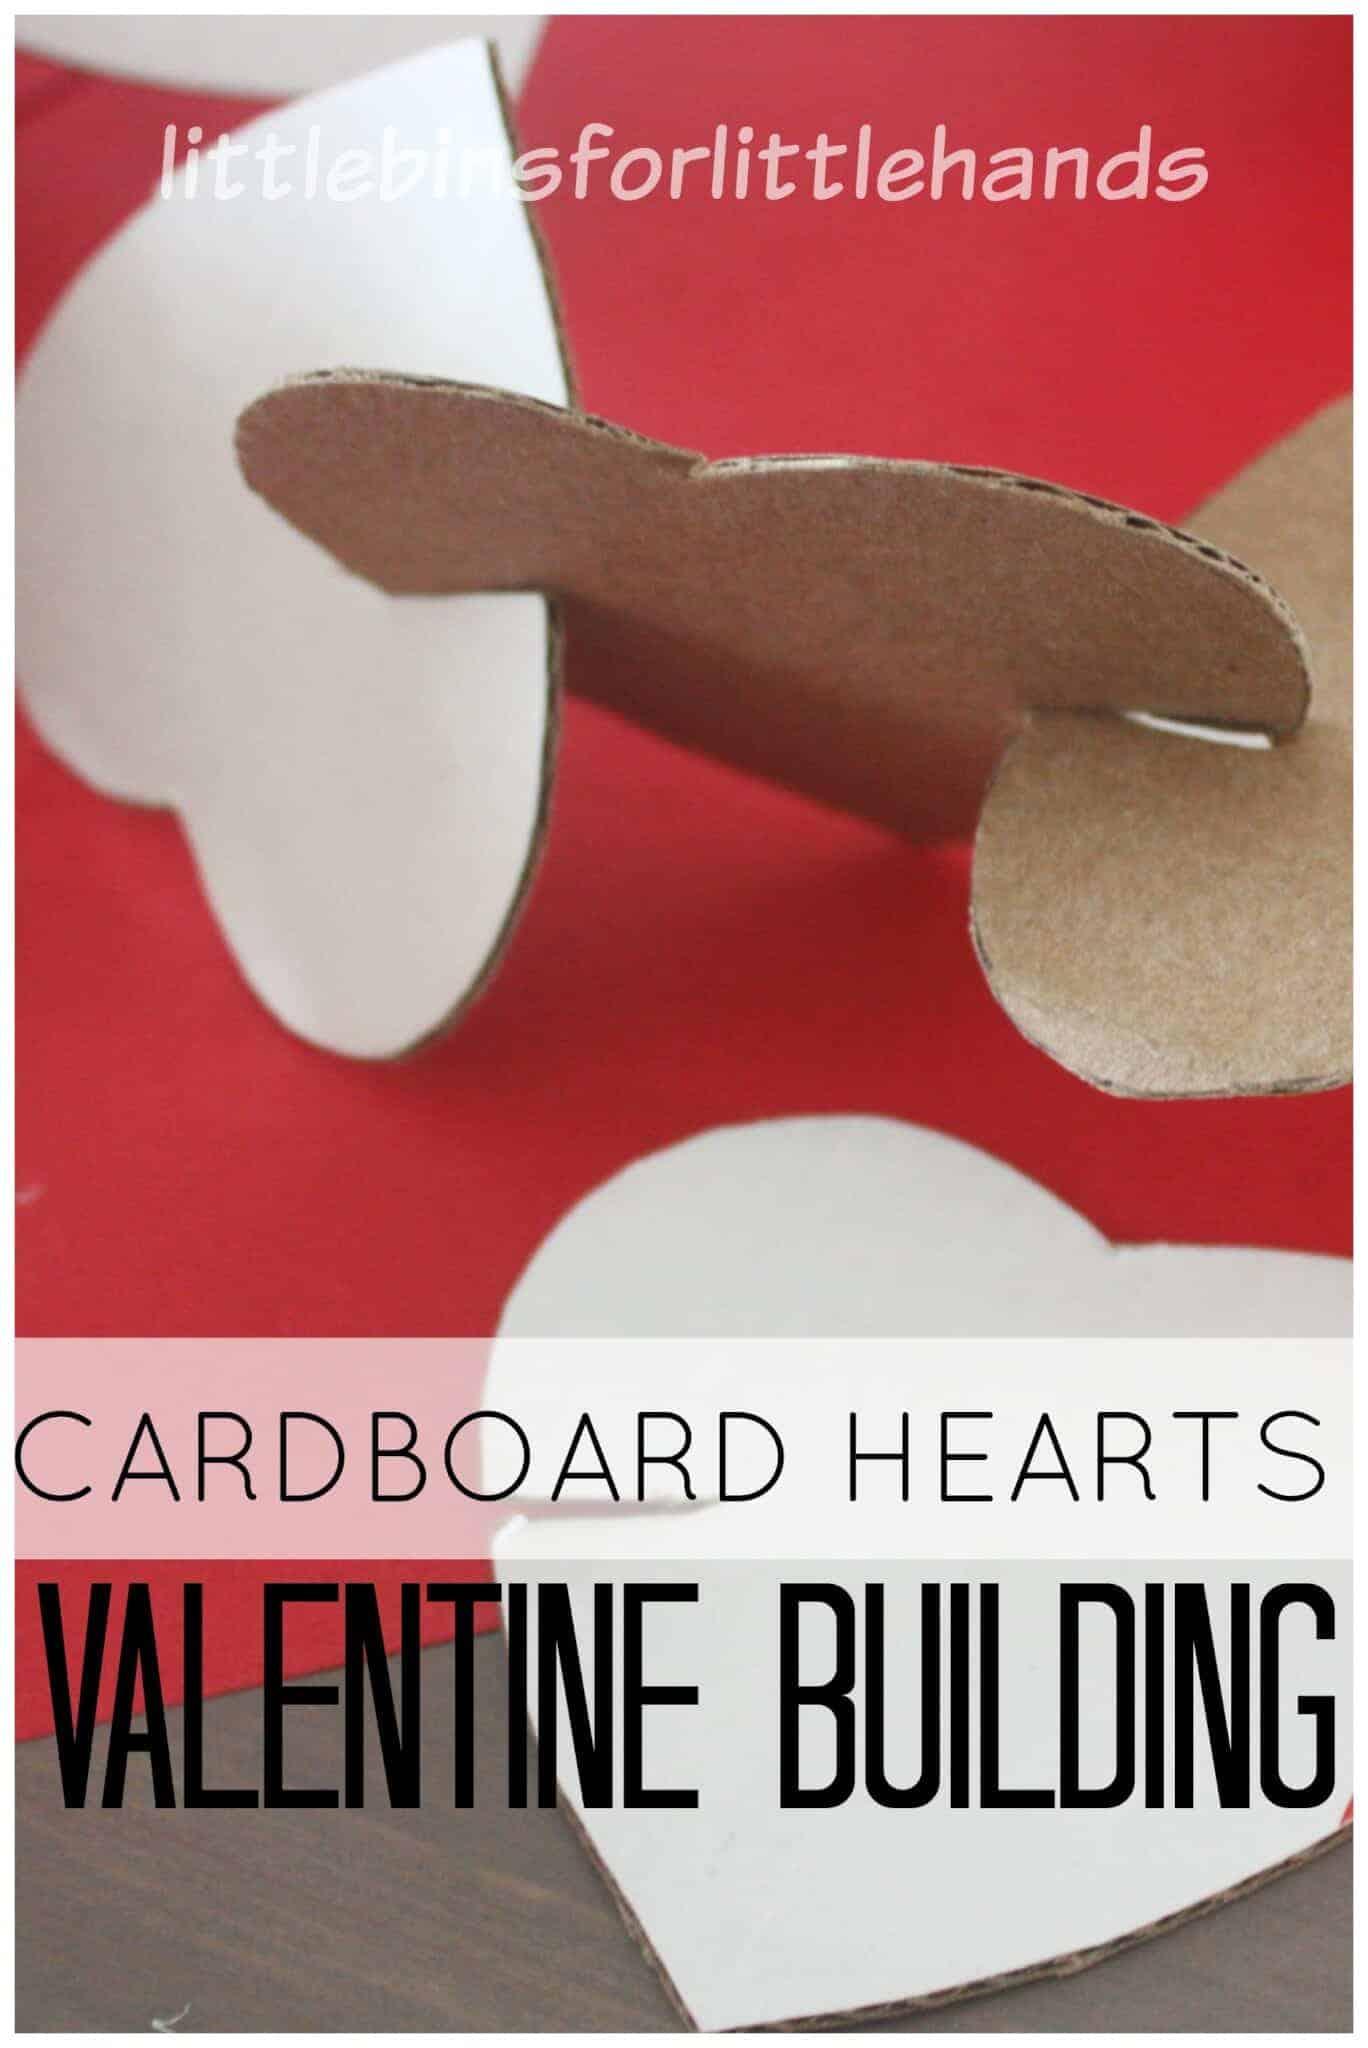 Cardboard Hearts Building Activity for Kids | 1368 x 2048 jpeg 180kB